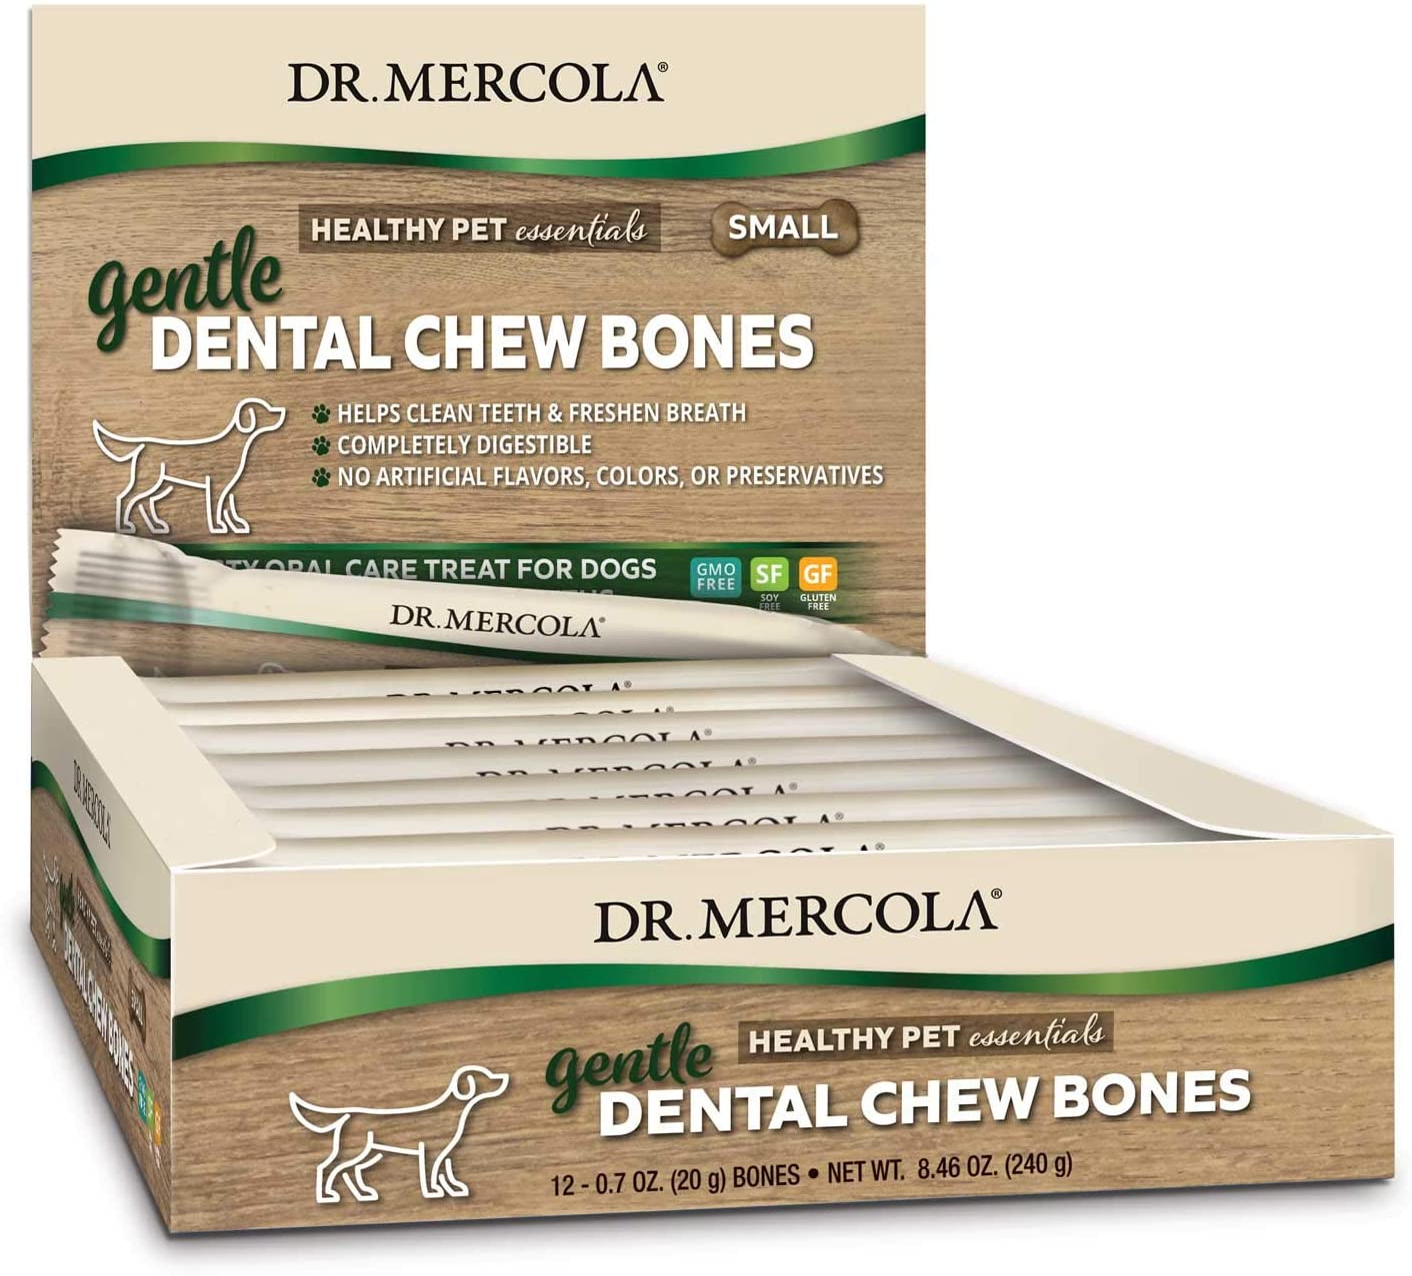 Dr. Mercola Gentle Dental Chew Bones, 12 Bones, Non GMO, Gluten Free, Soy Free